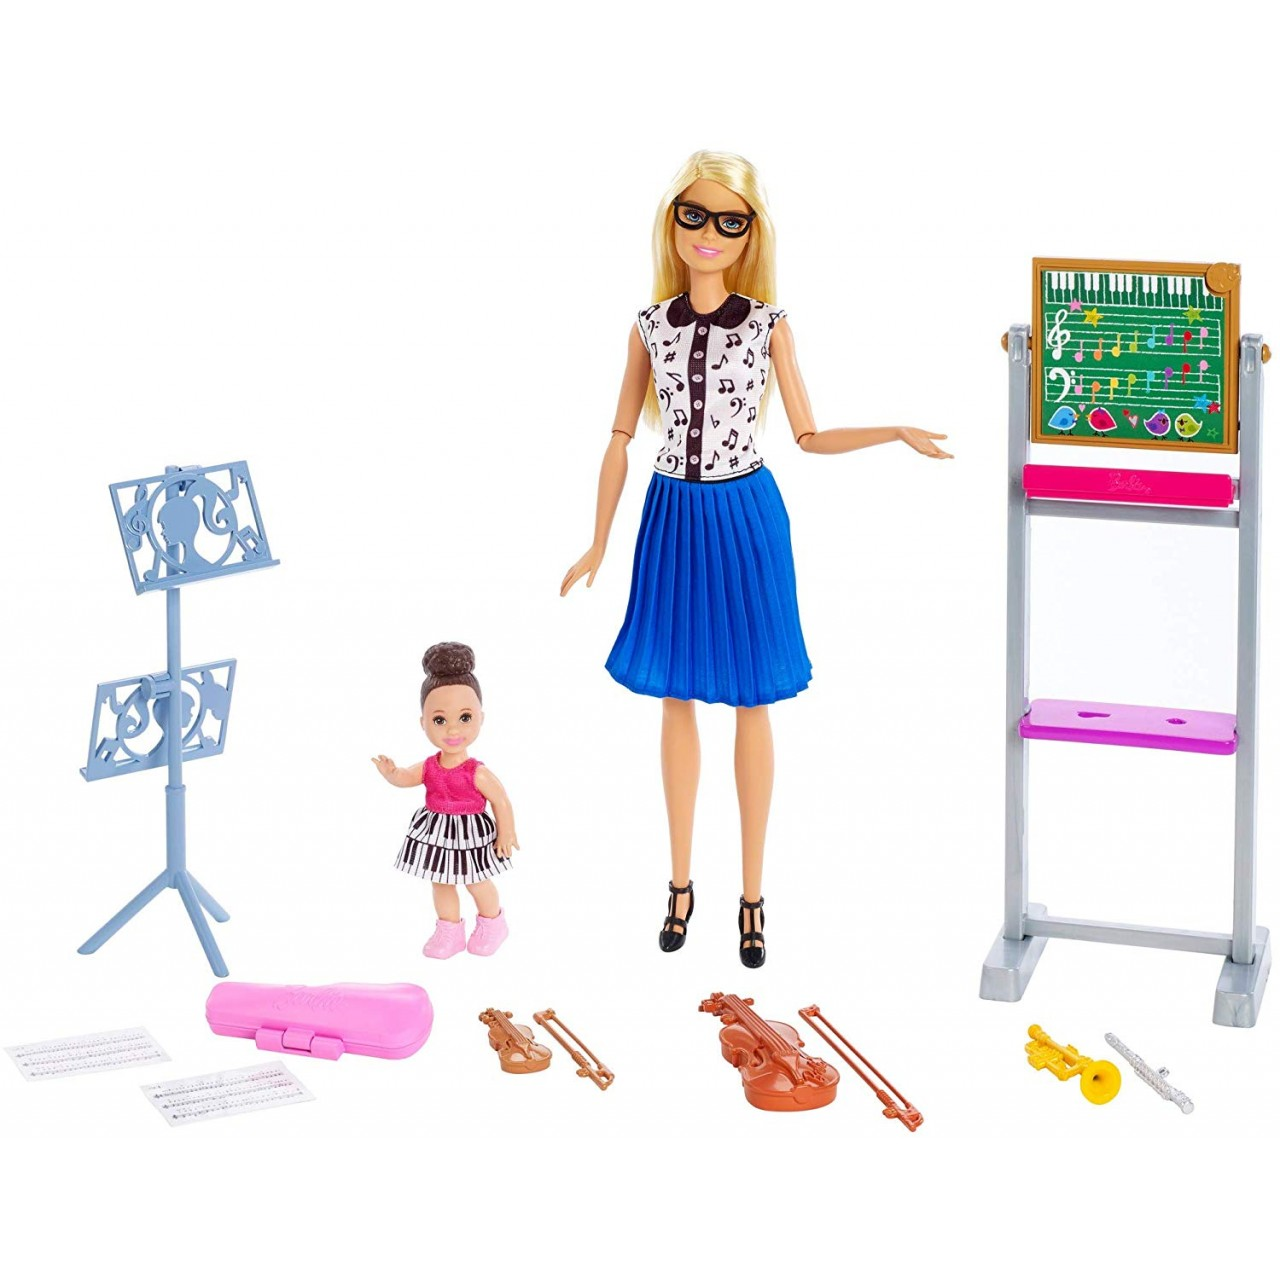 Набор кукла Барби учитель музыки FXP18 (Barbie Music Teacher Doll)